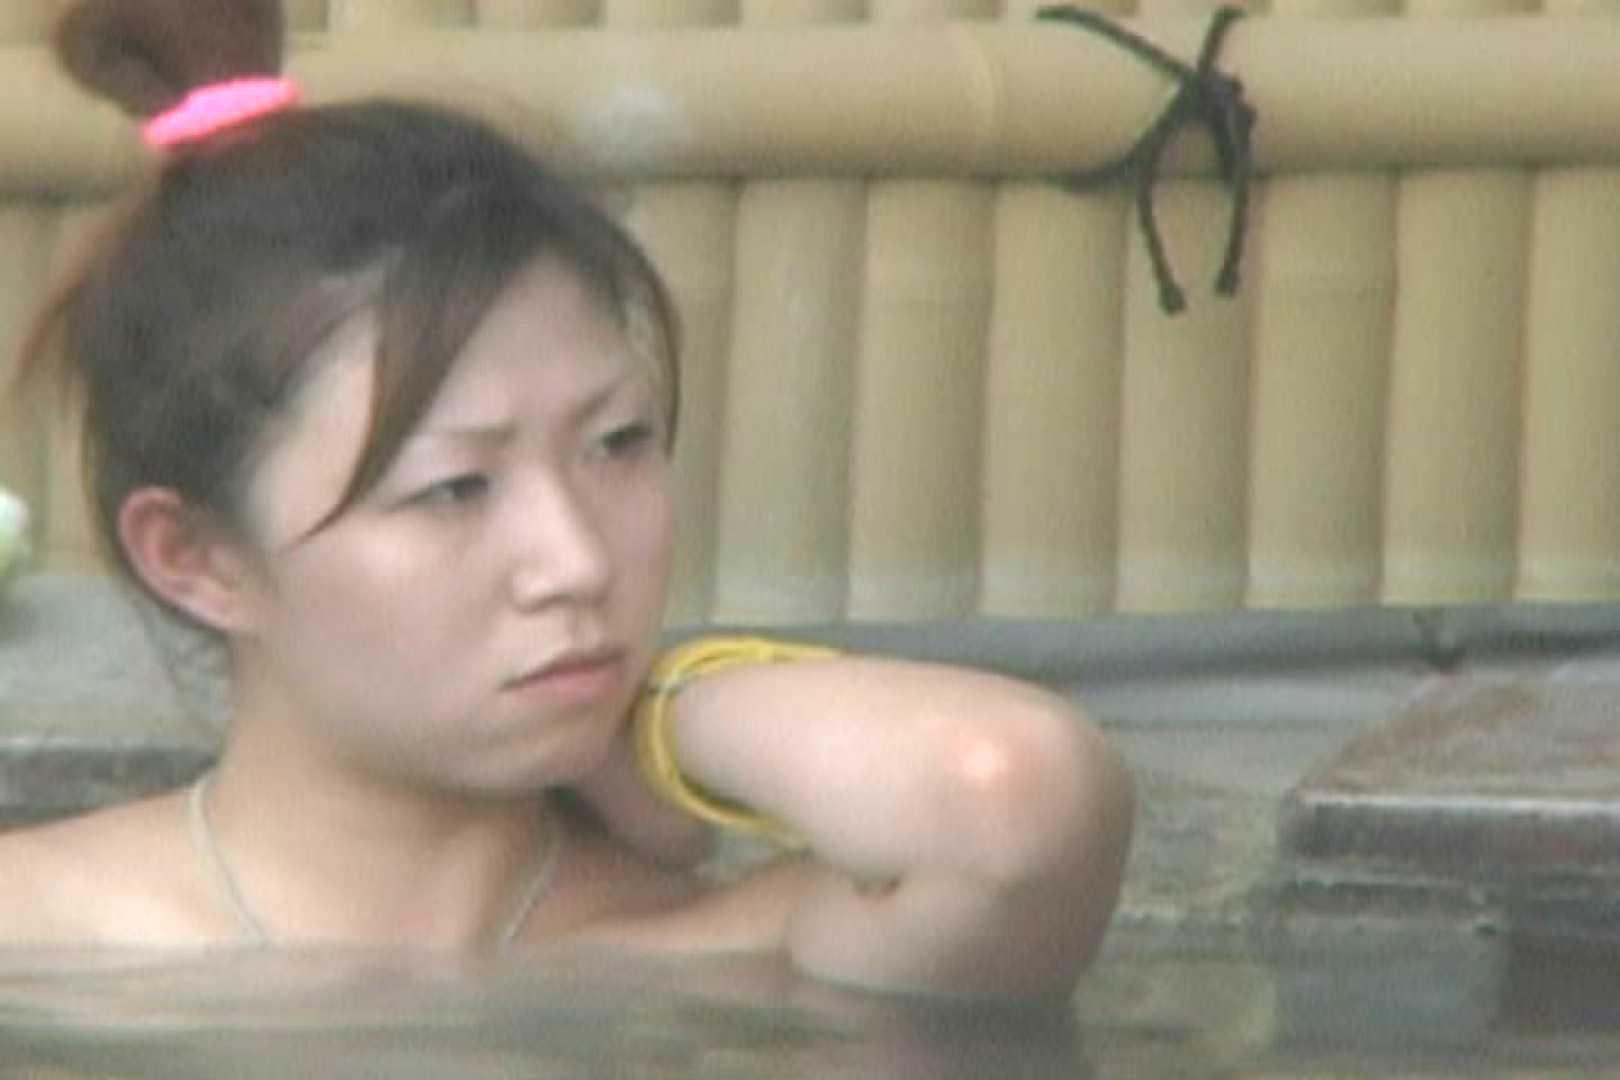 Aquaな露天風呂Vol.593 HなOL   盗撮  91pic 13